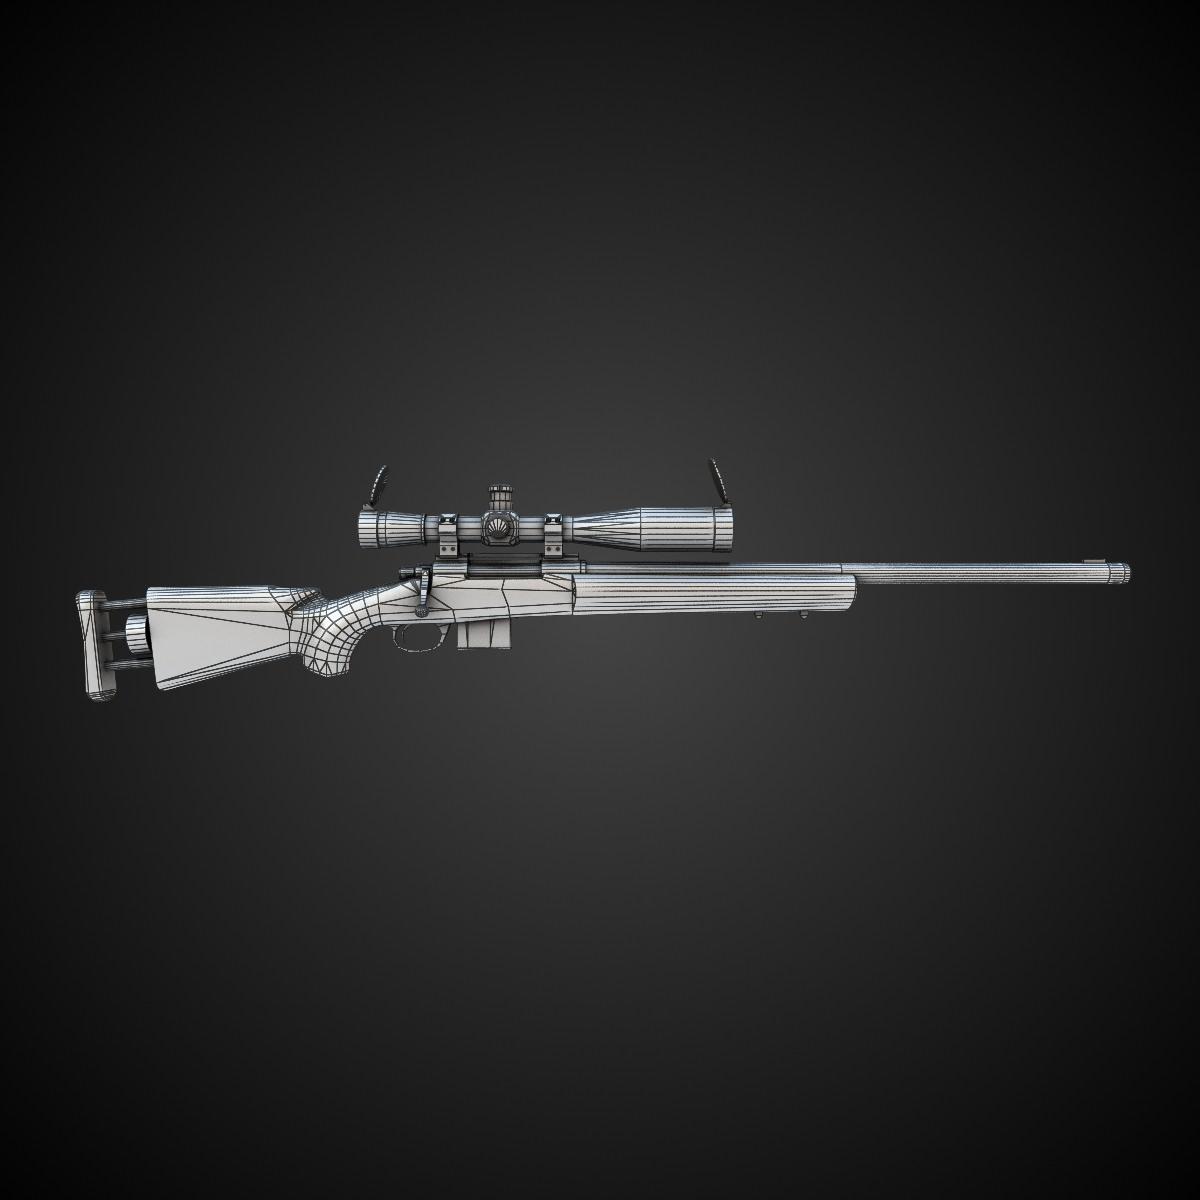 m24a2 sniper rifle - photo #18